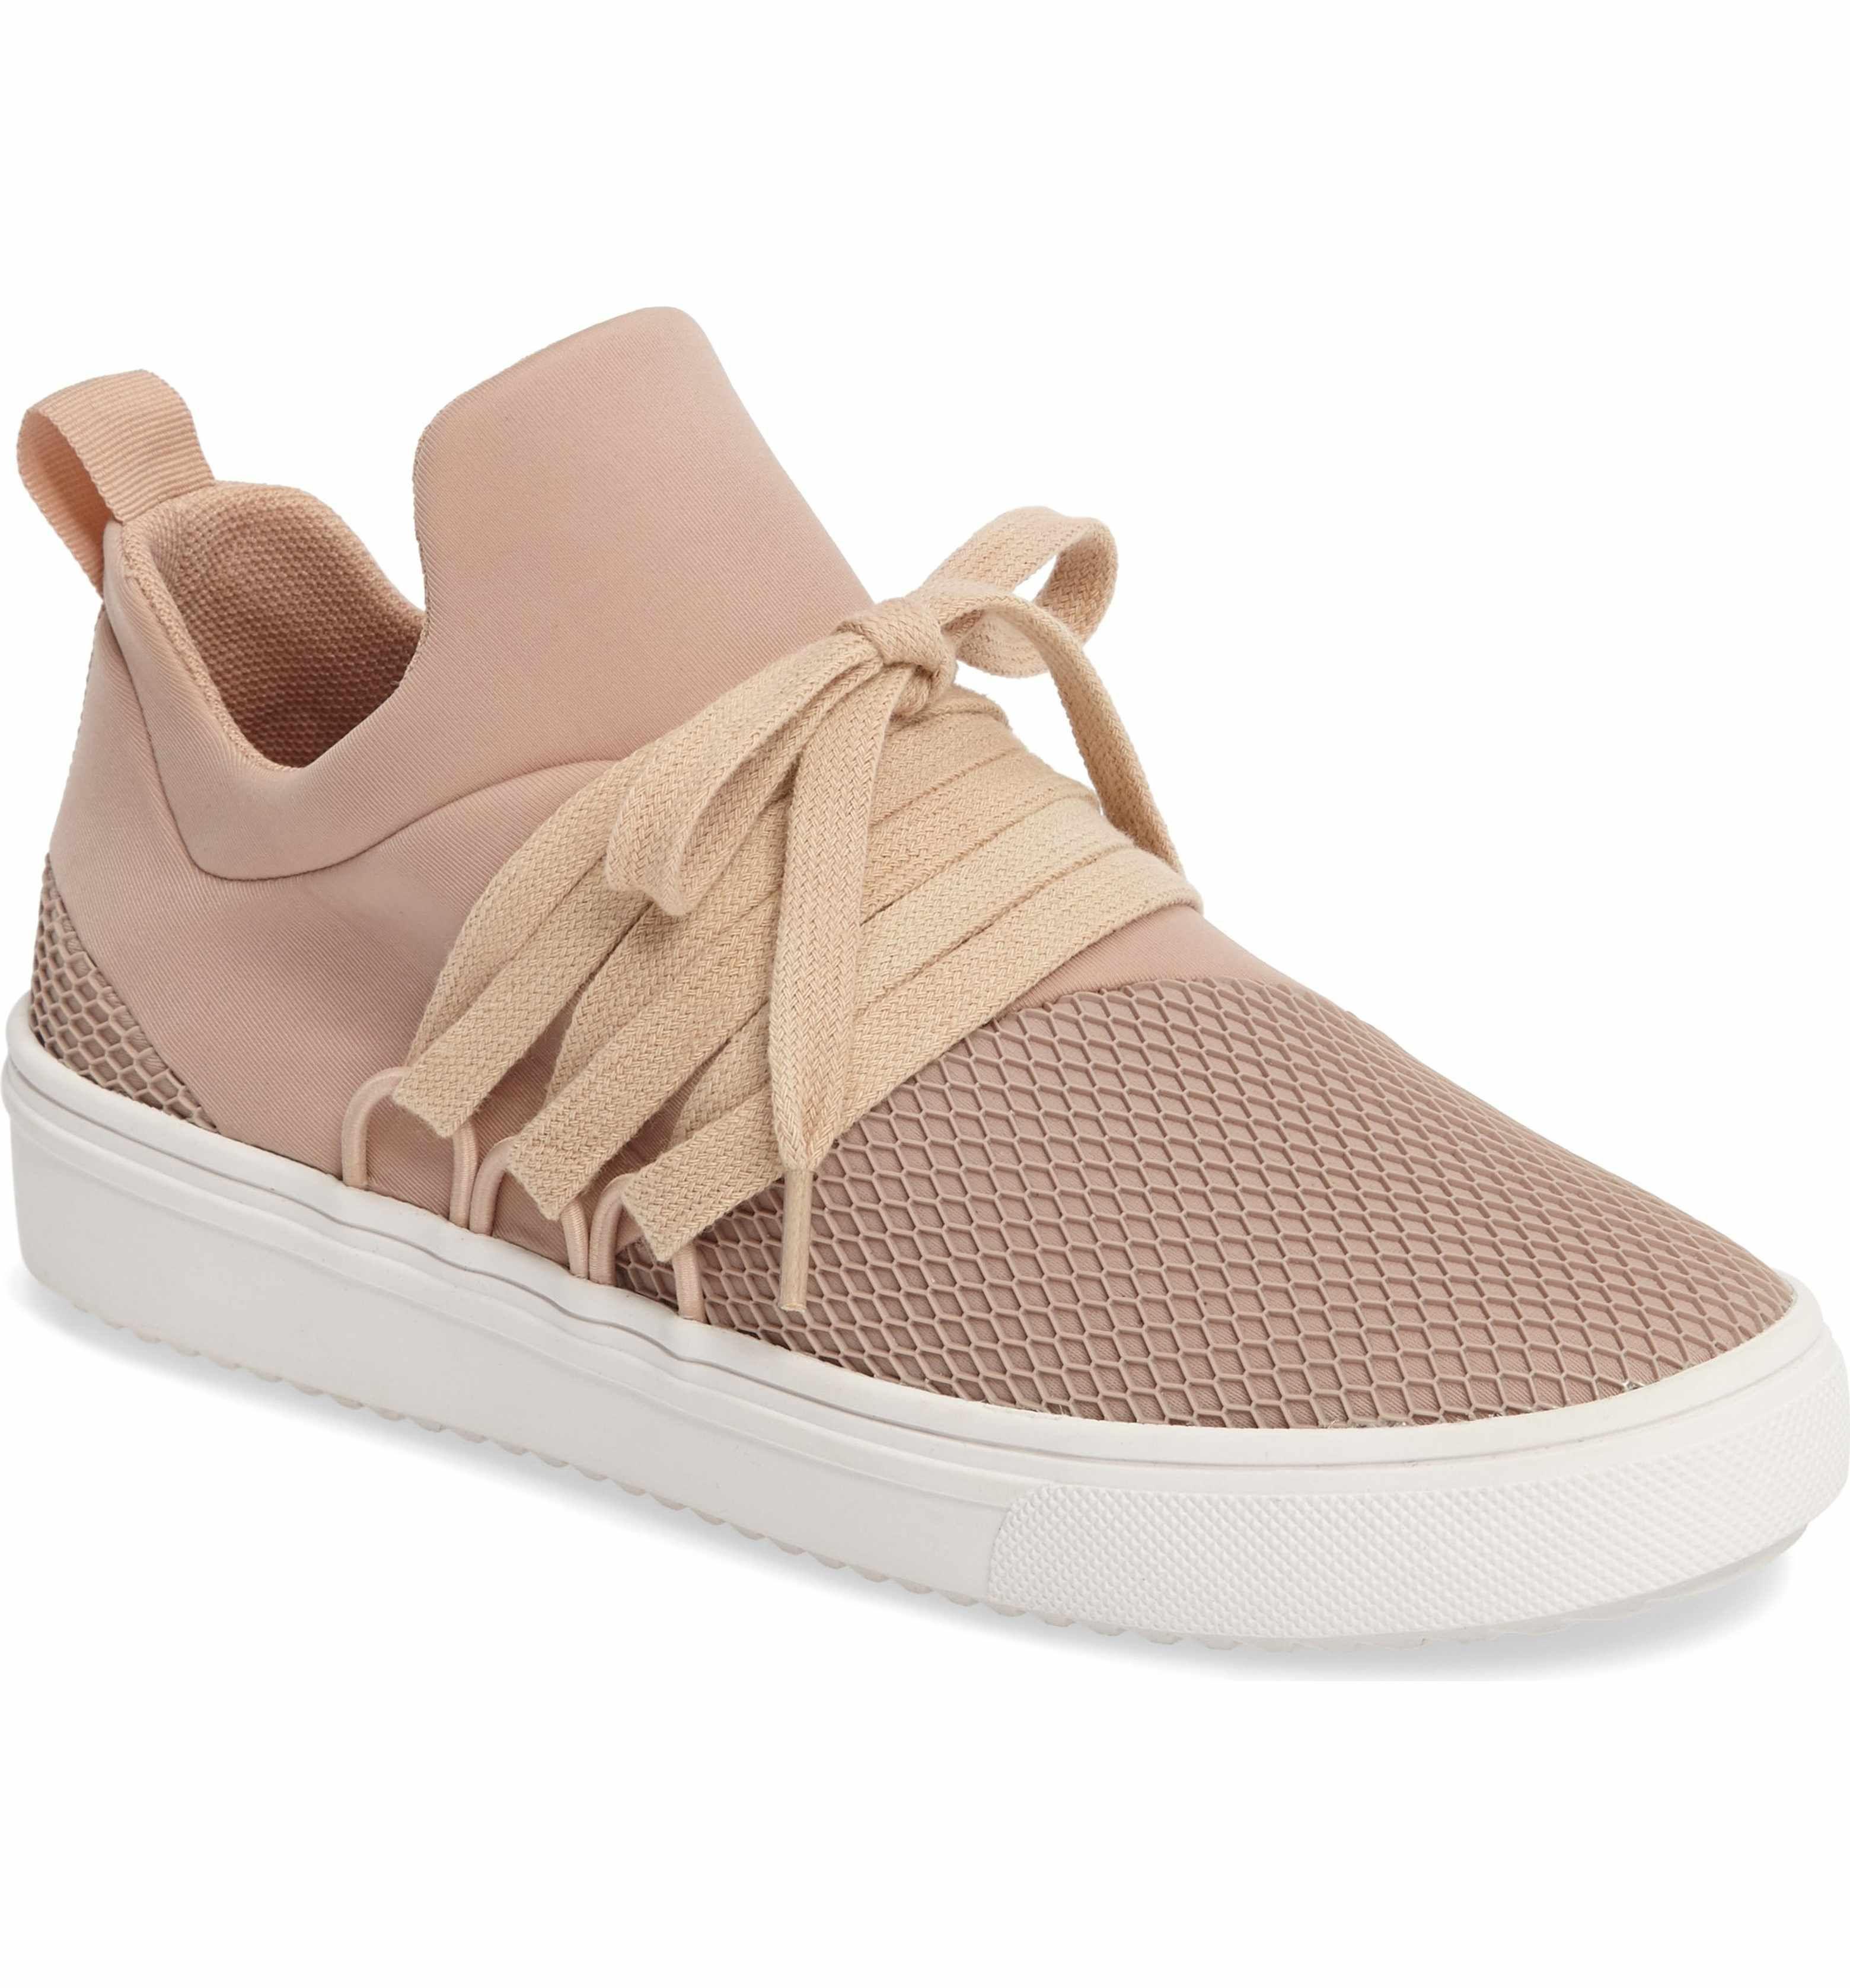 separation shoes 9a955 38a12 adidas originals superstar womens nordstrom nz